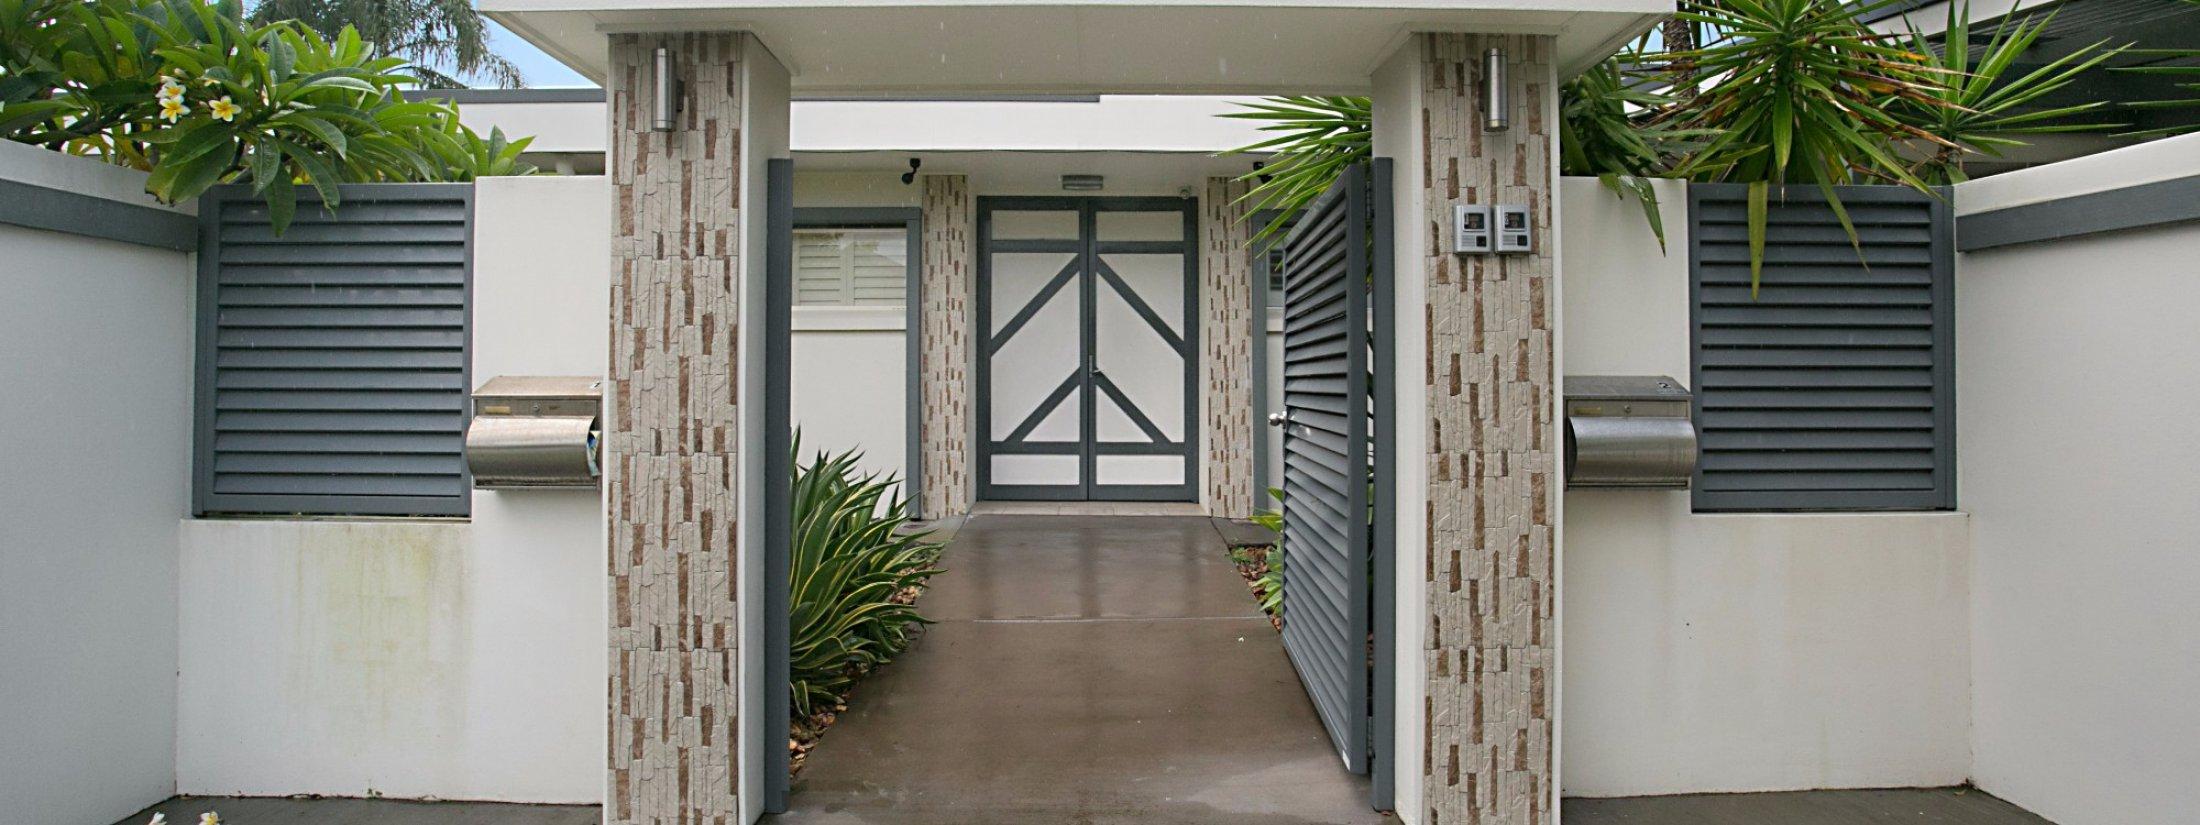 La Casetta - Broadbeach - Entrance to property